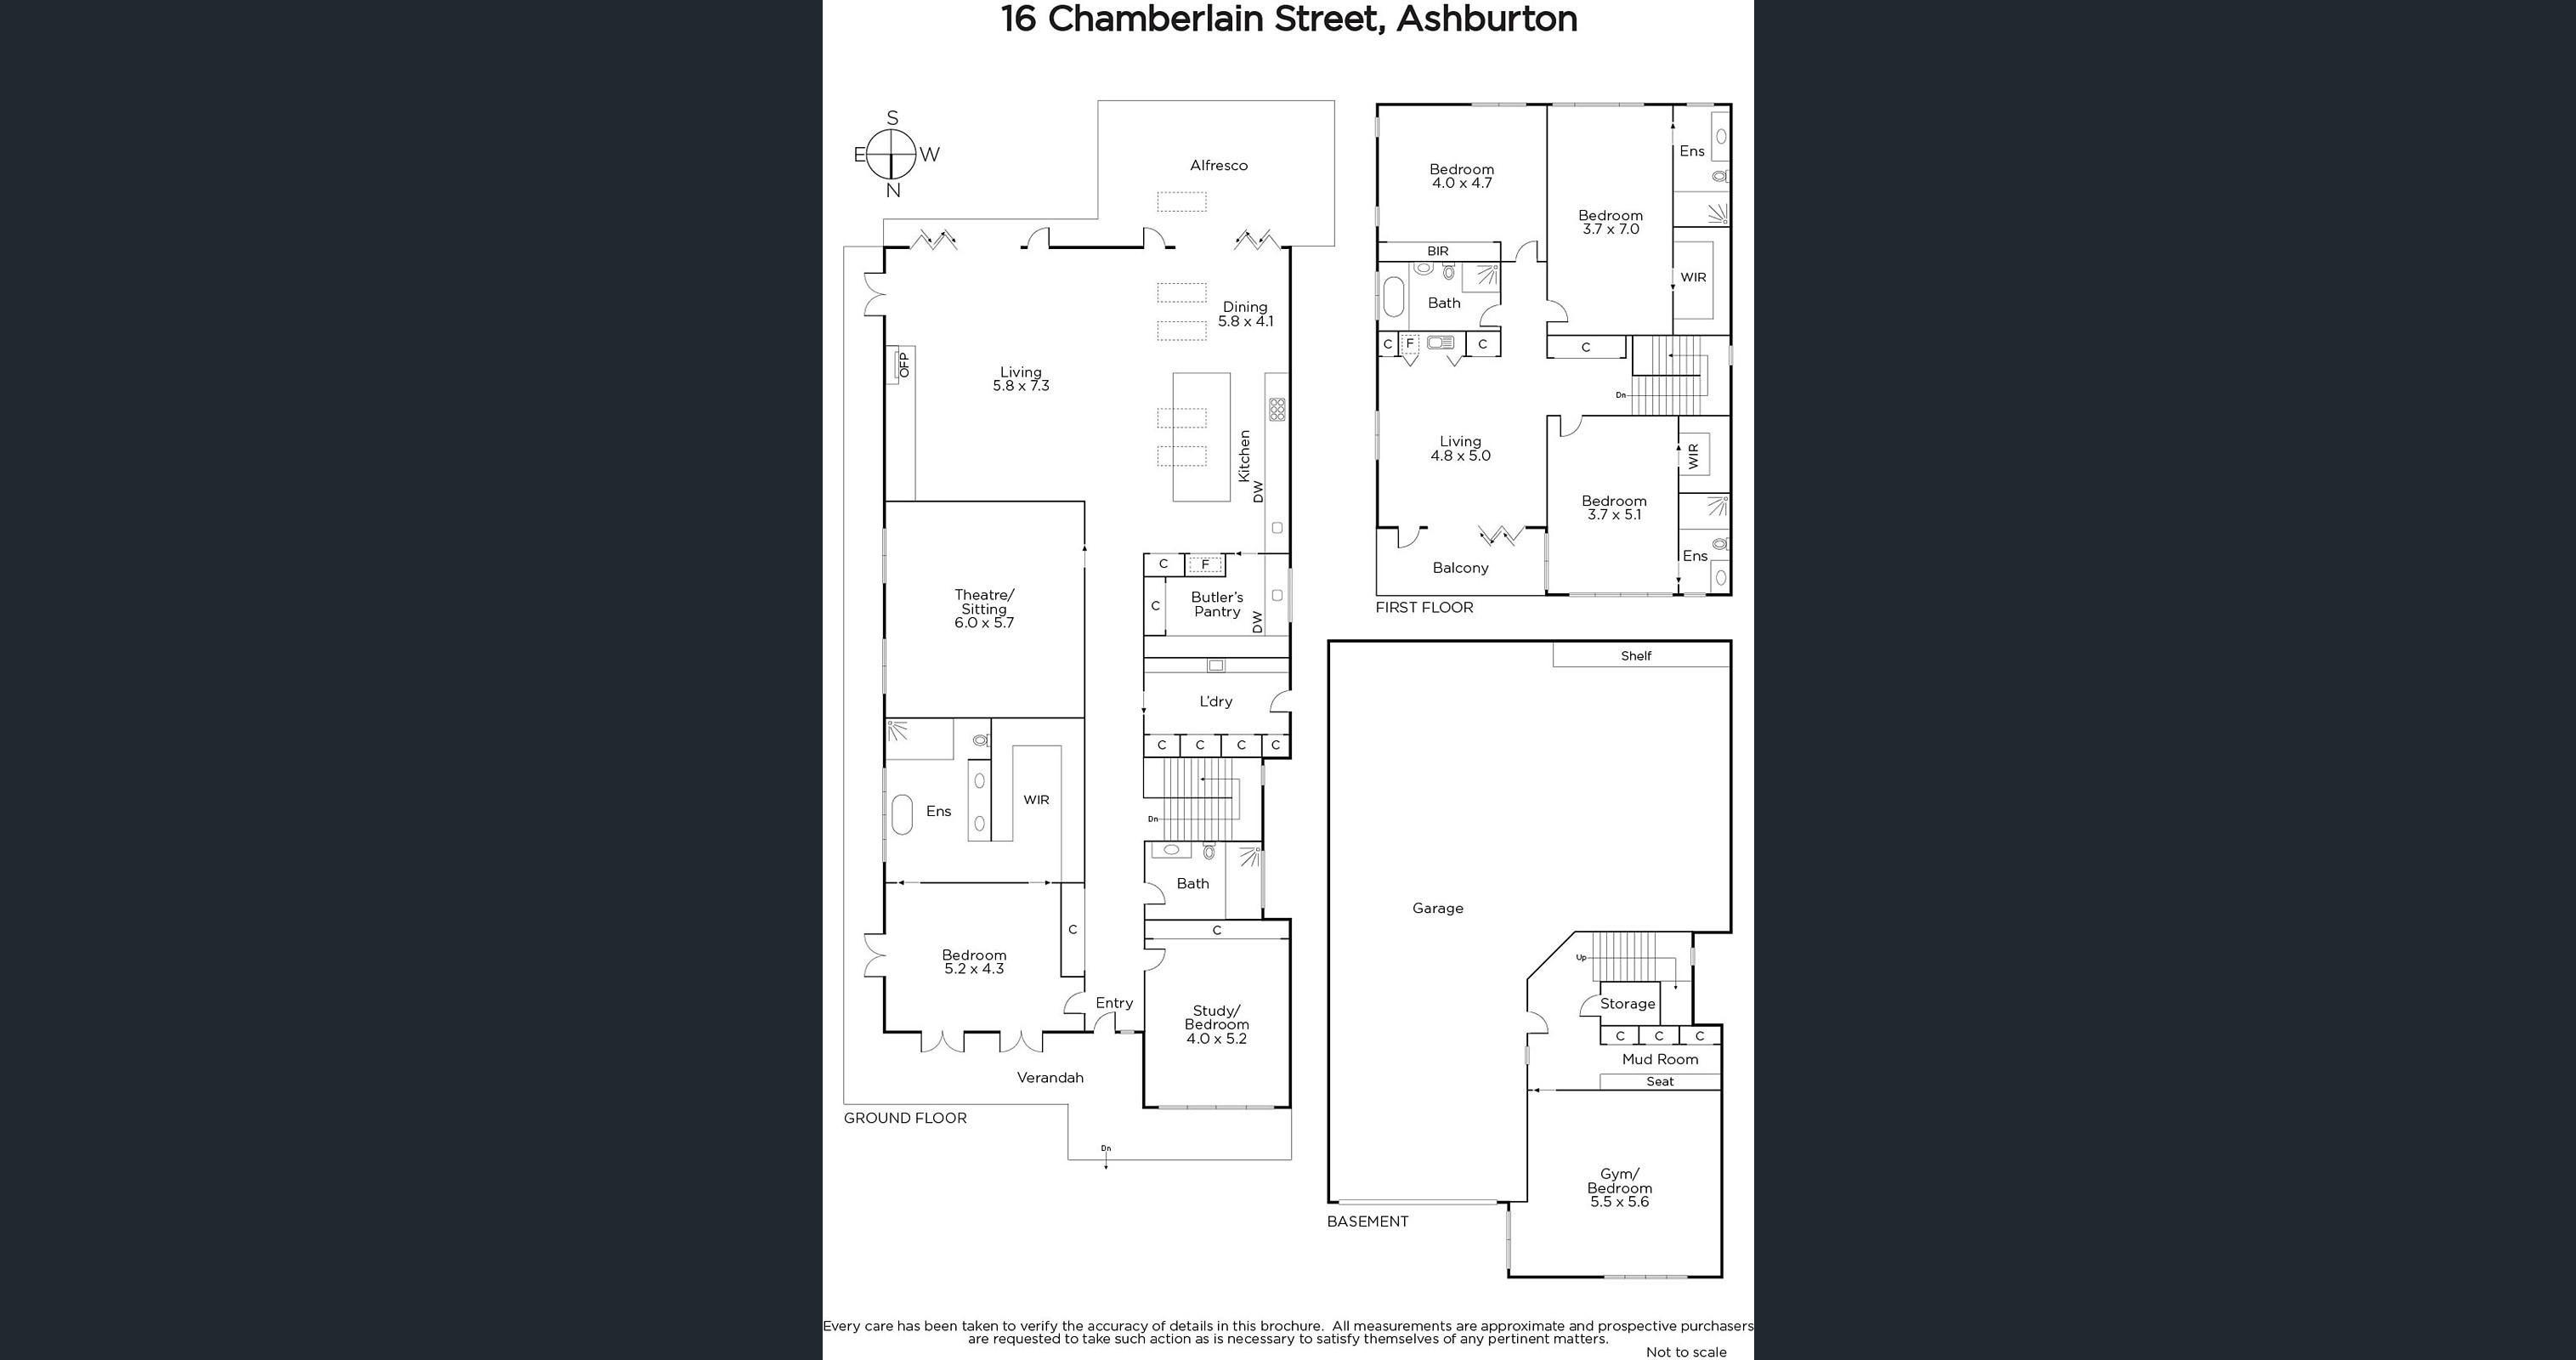 16 chamberlain street ashburton vic 3147 property details 16 chamberlain street ashburton vic 3147 property details malvernweather Images